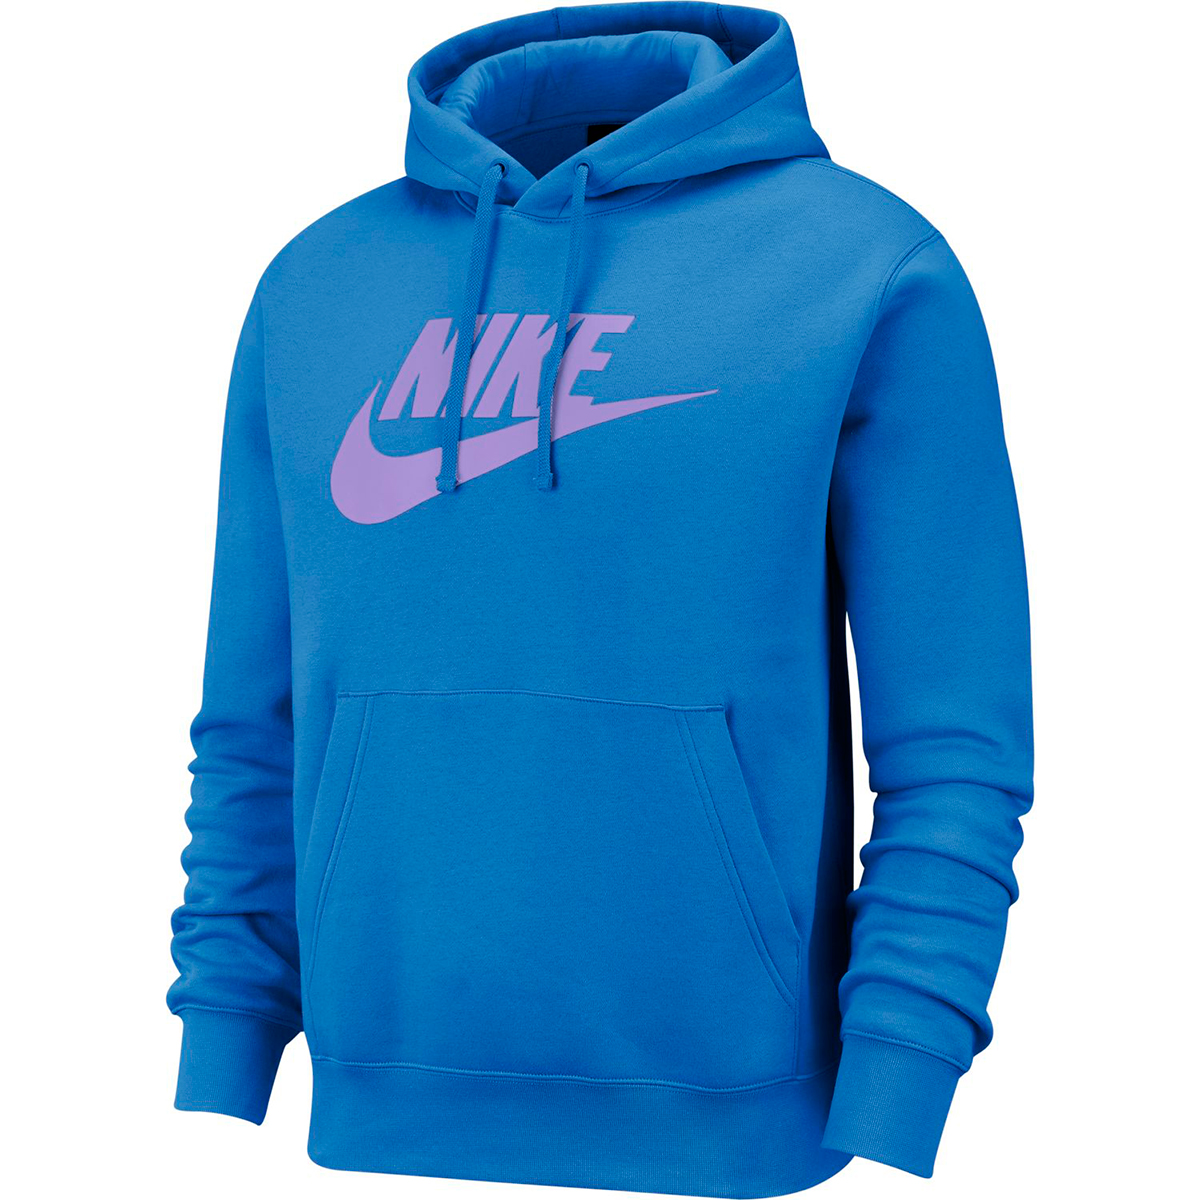 Nike Men's Club Gx Hoodie - Blue, L